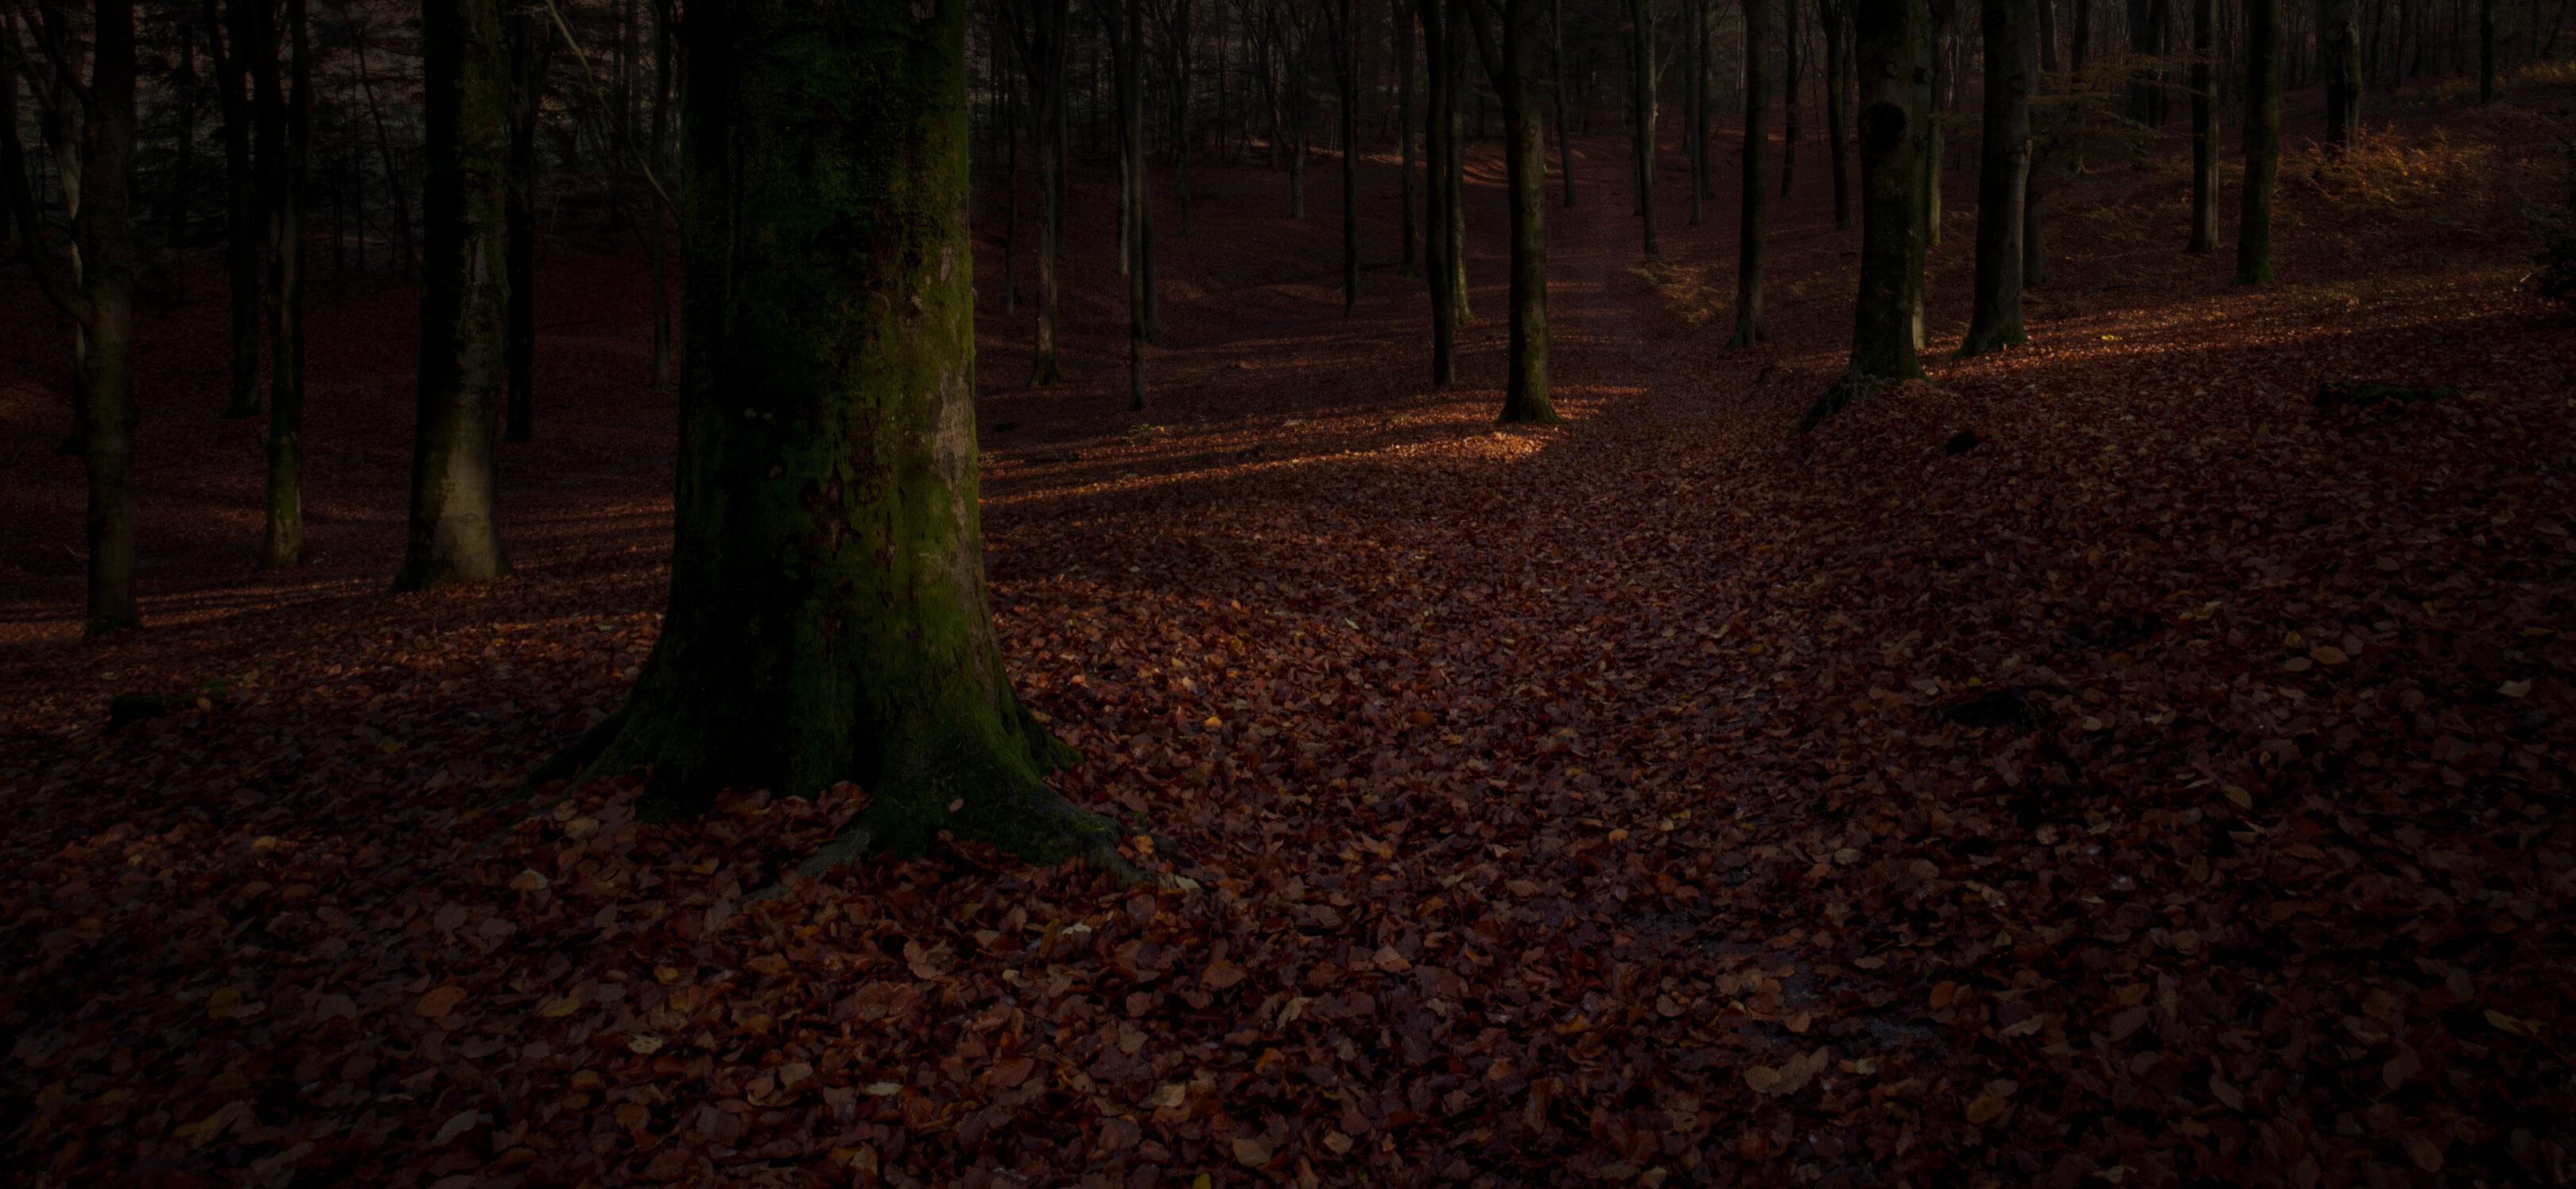 Jur Jurjen Poeles fotografie fragment landschap from dusk till dawn duister ochtendgloren dageraad vrijwerk vrij werk kunst kunstfotografie bos bospad